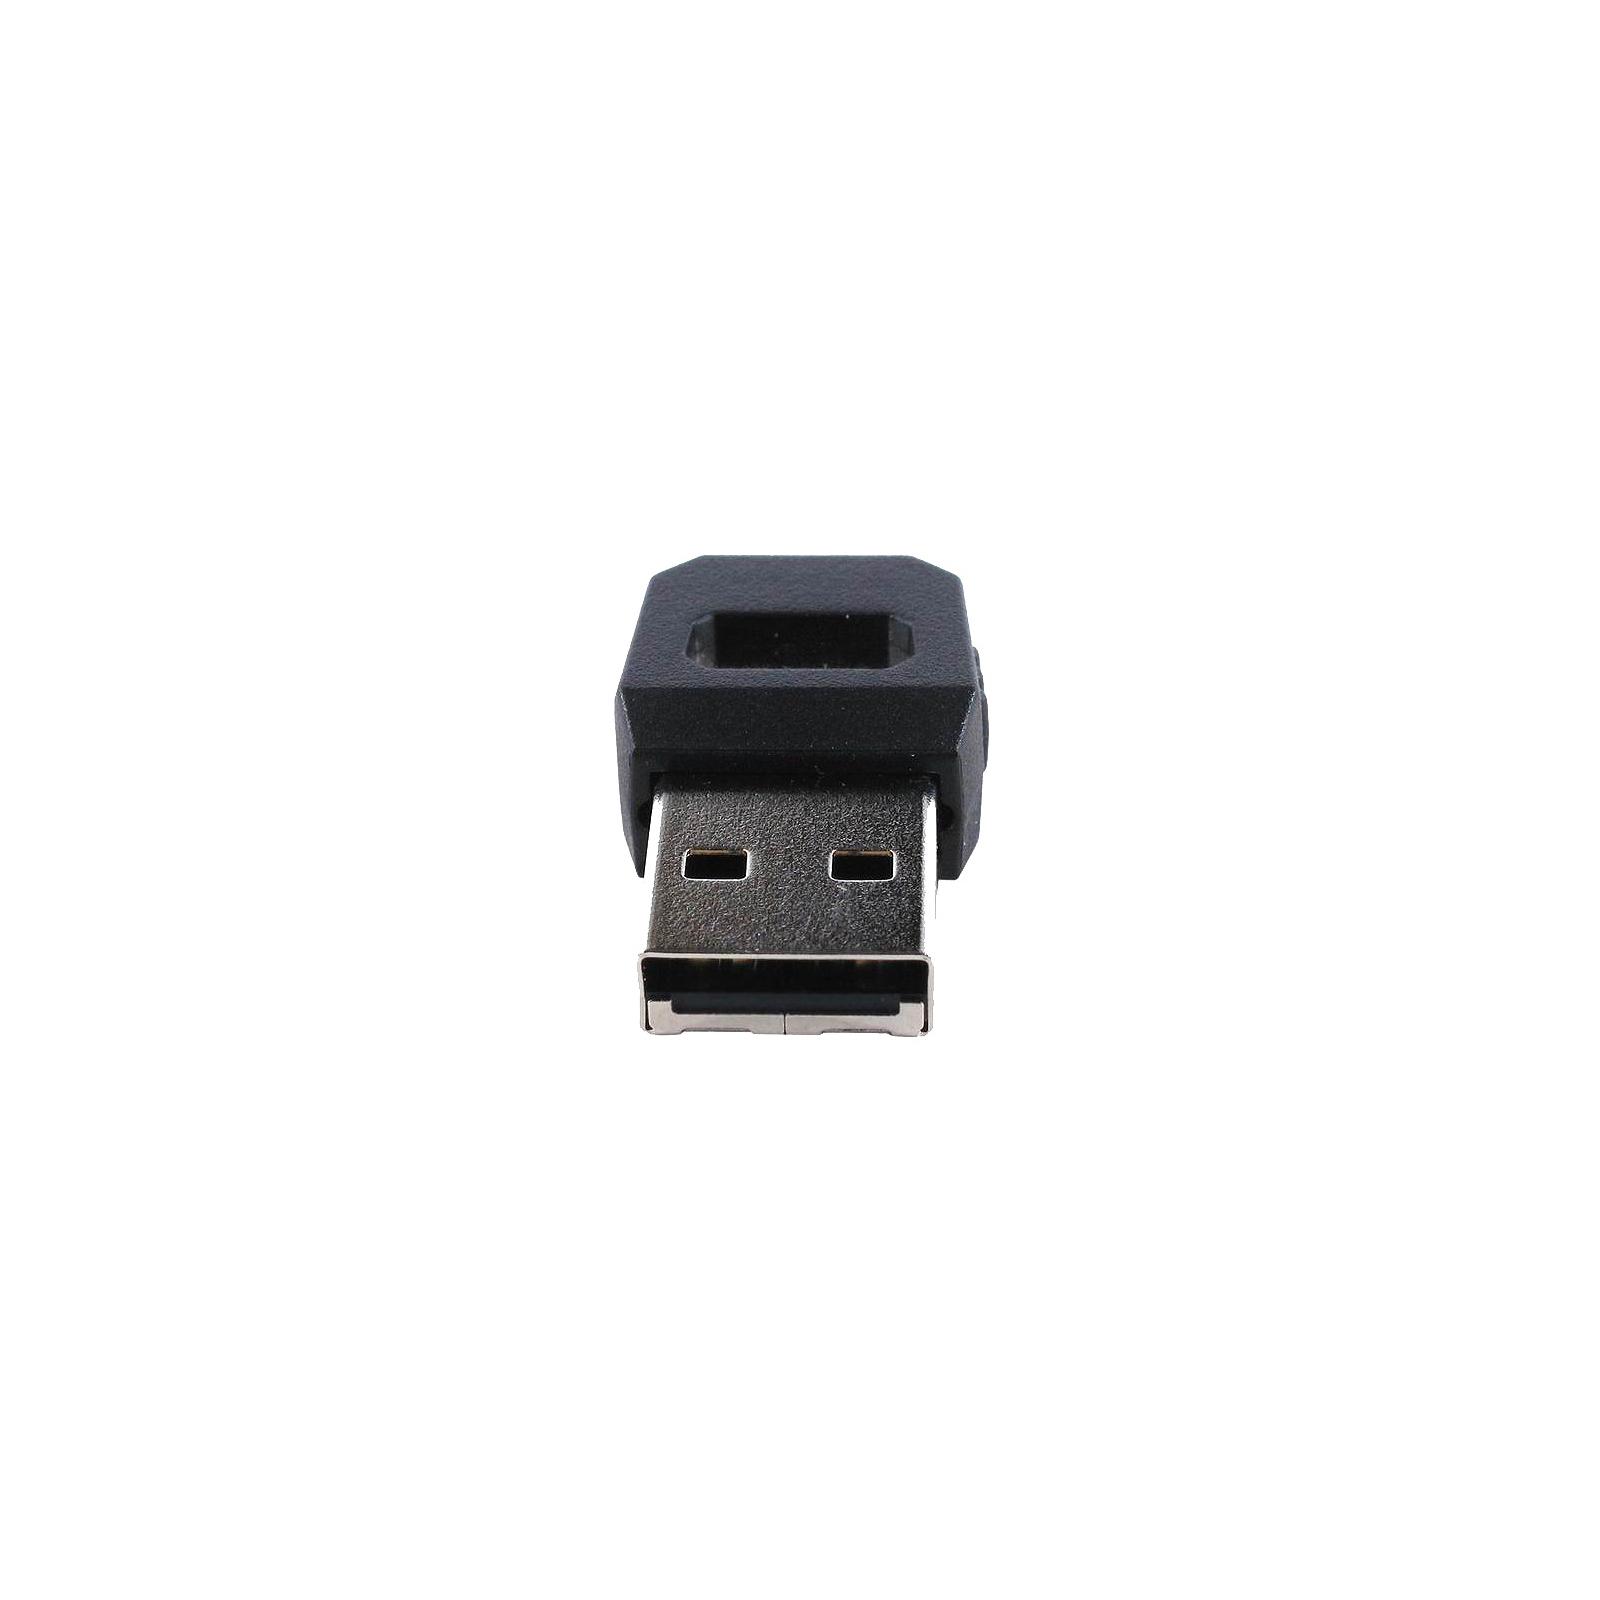 USB флеш накопитель 8GB AH134 Black RP USB2.0 Apacer (AP8GAH134B-1) изображение 6